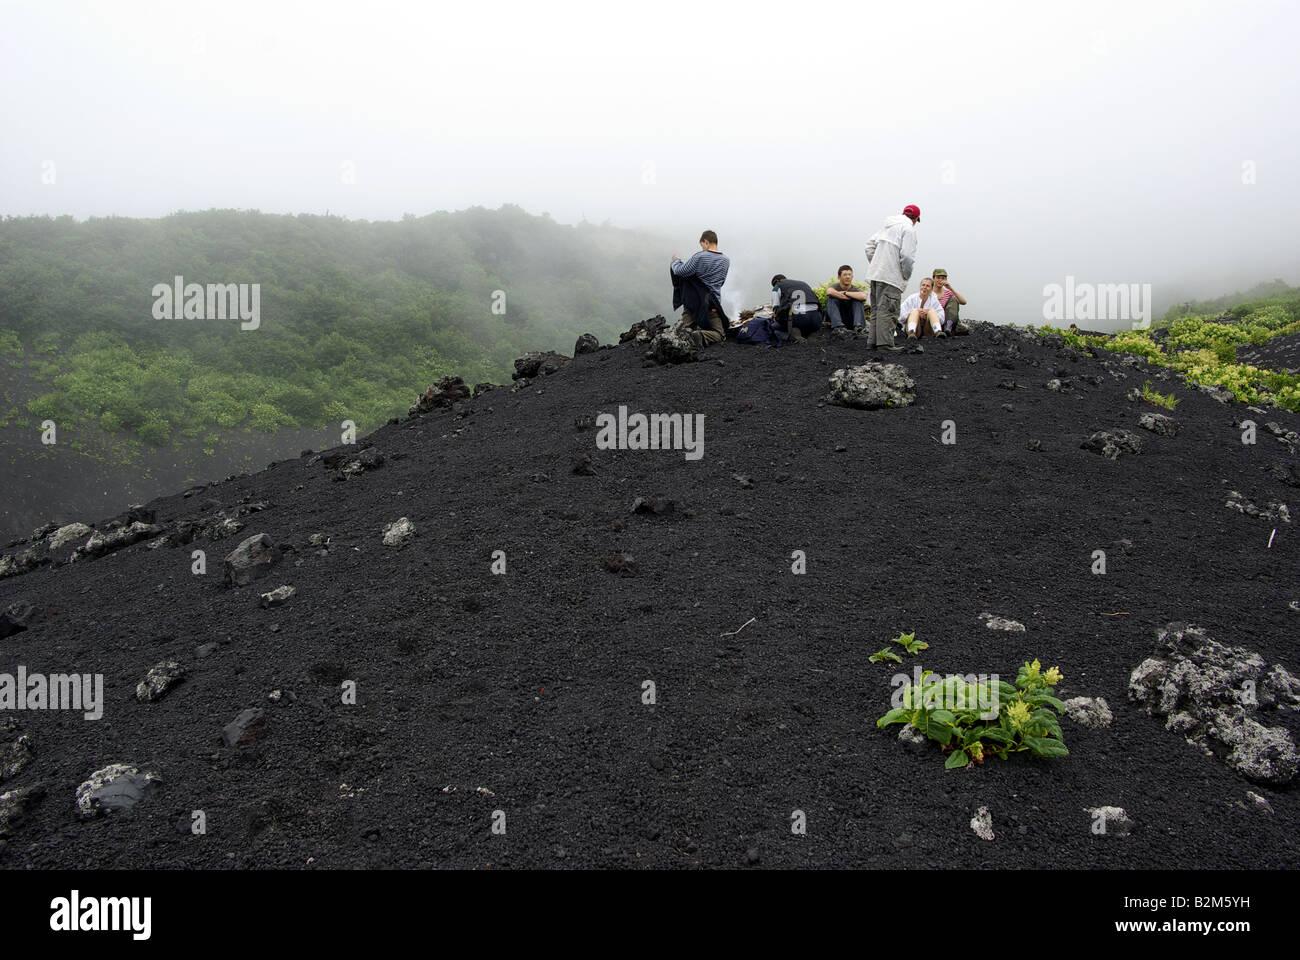 People are climbing on volcano Tya Tya, Kunashir island, Kuril islands Far East of Russia - Stock Image